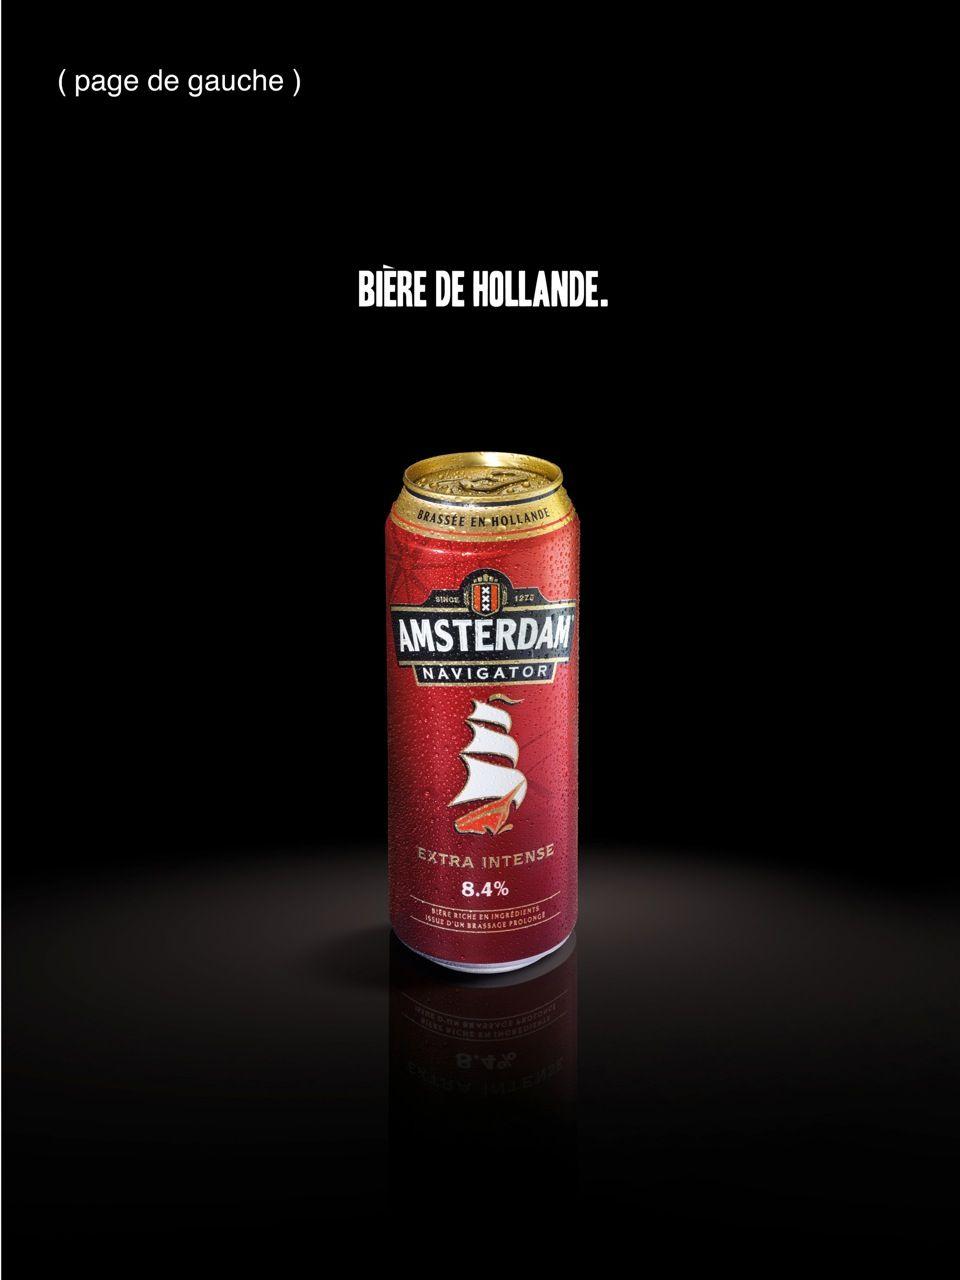 Amsterdam #advertising #print #ELYSEE2012 I Nicolas Baral